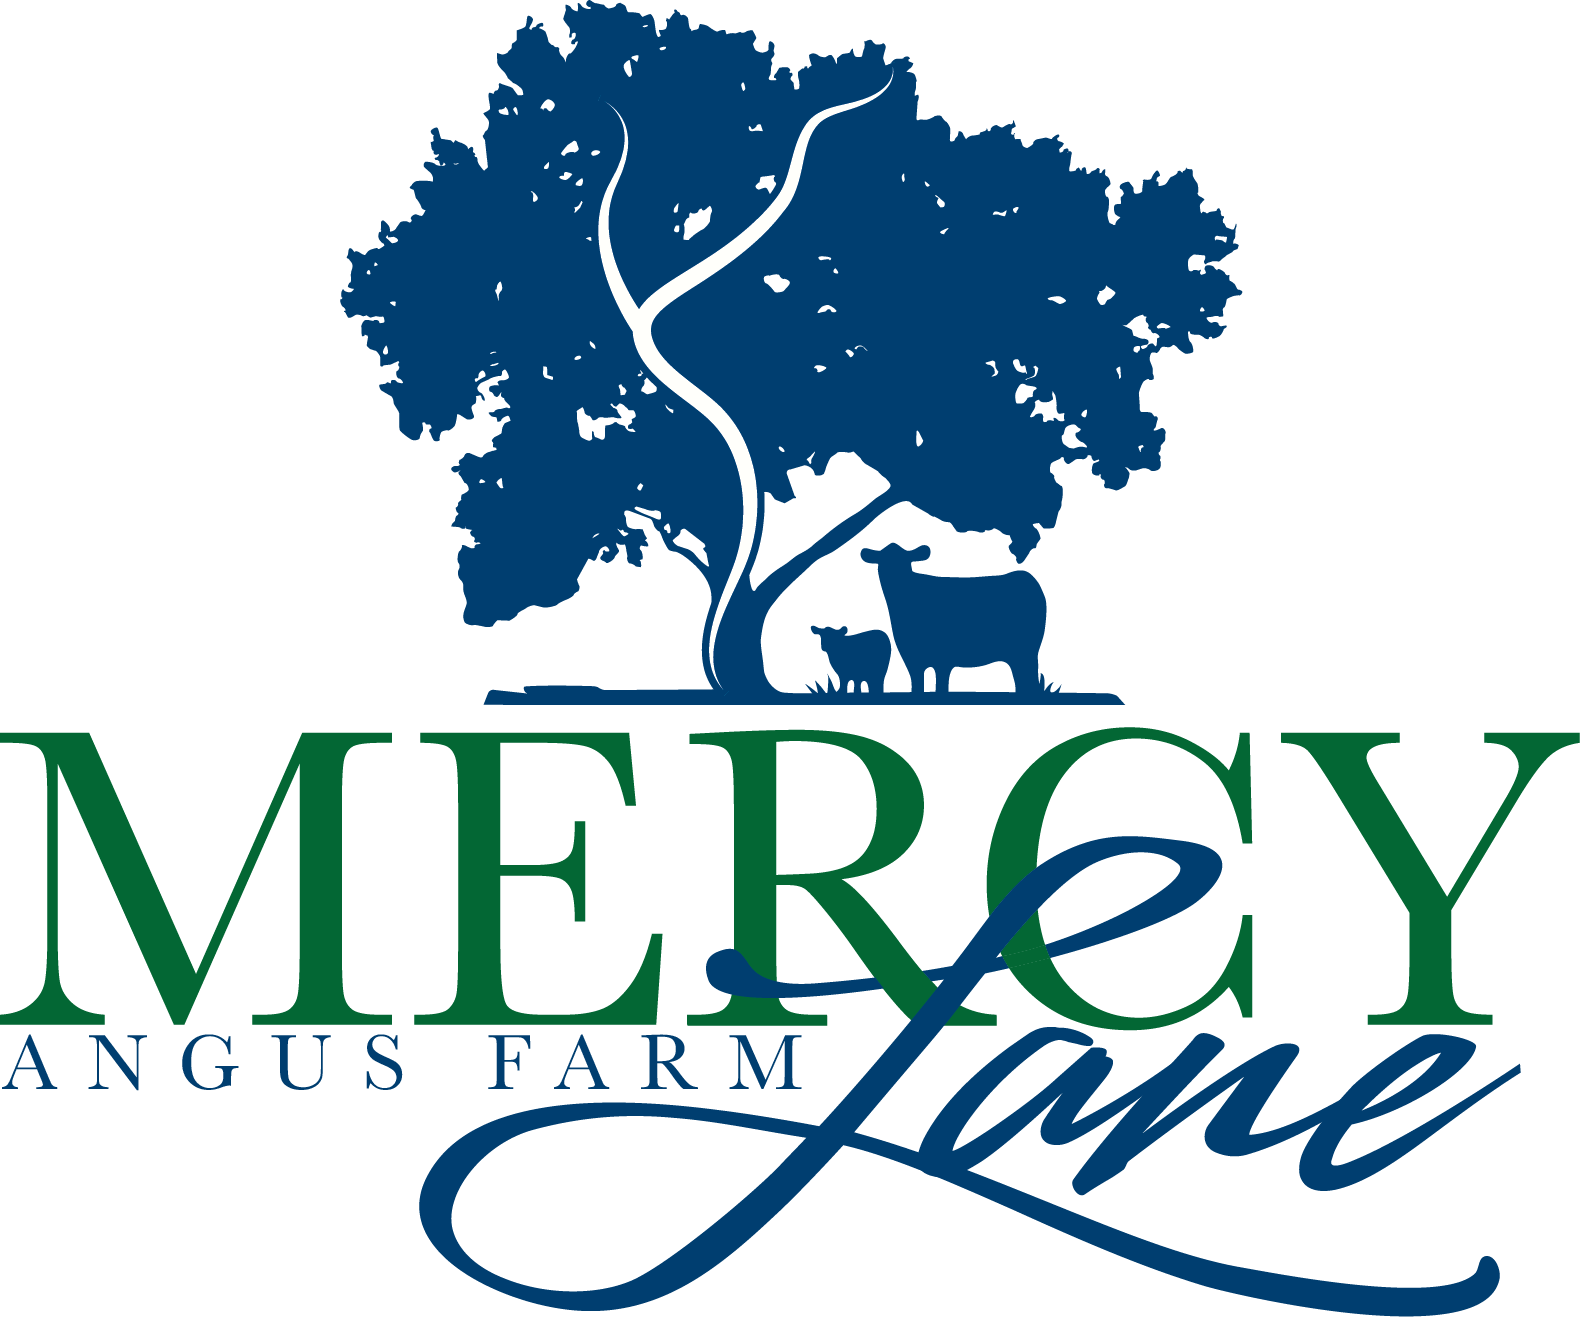 Mercy Lane Angus Farm, LLC